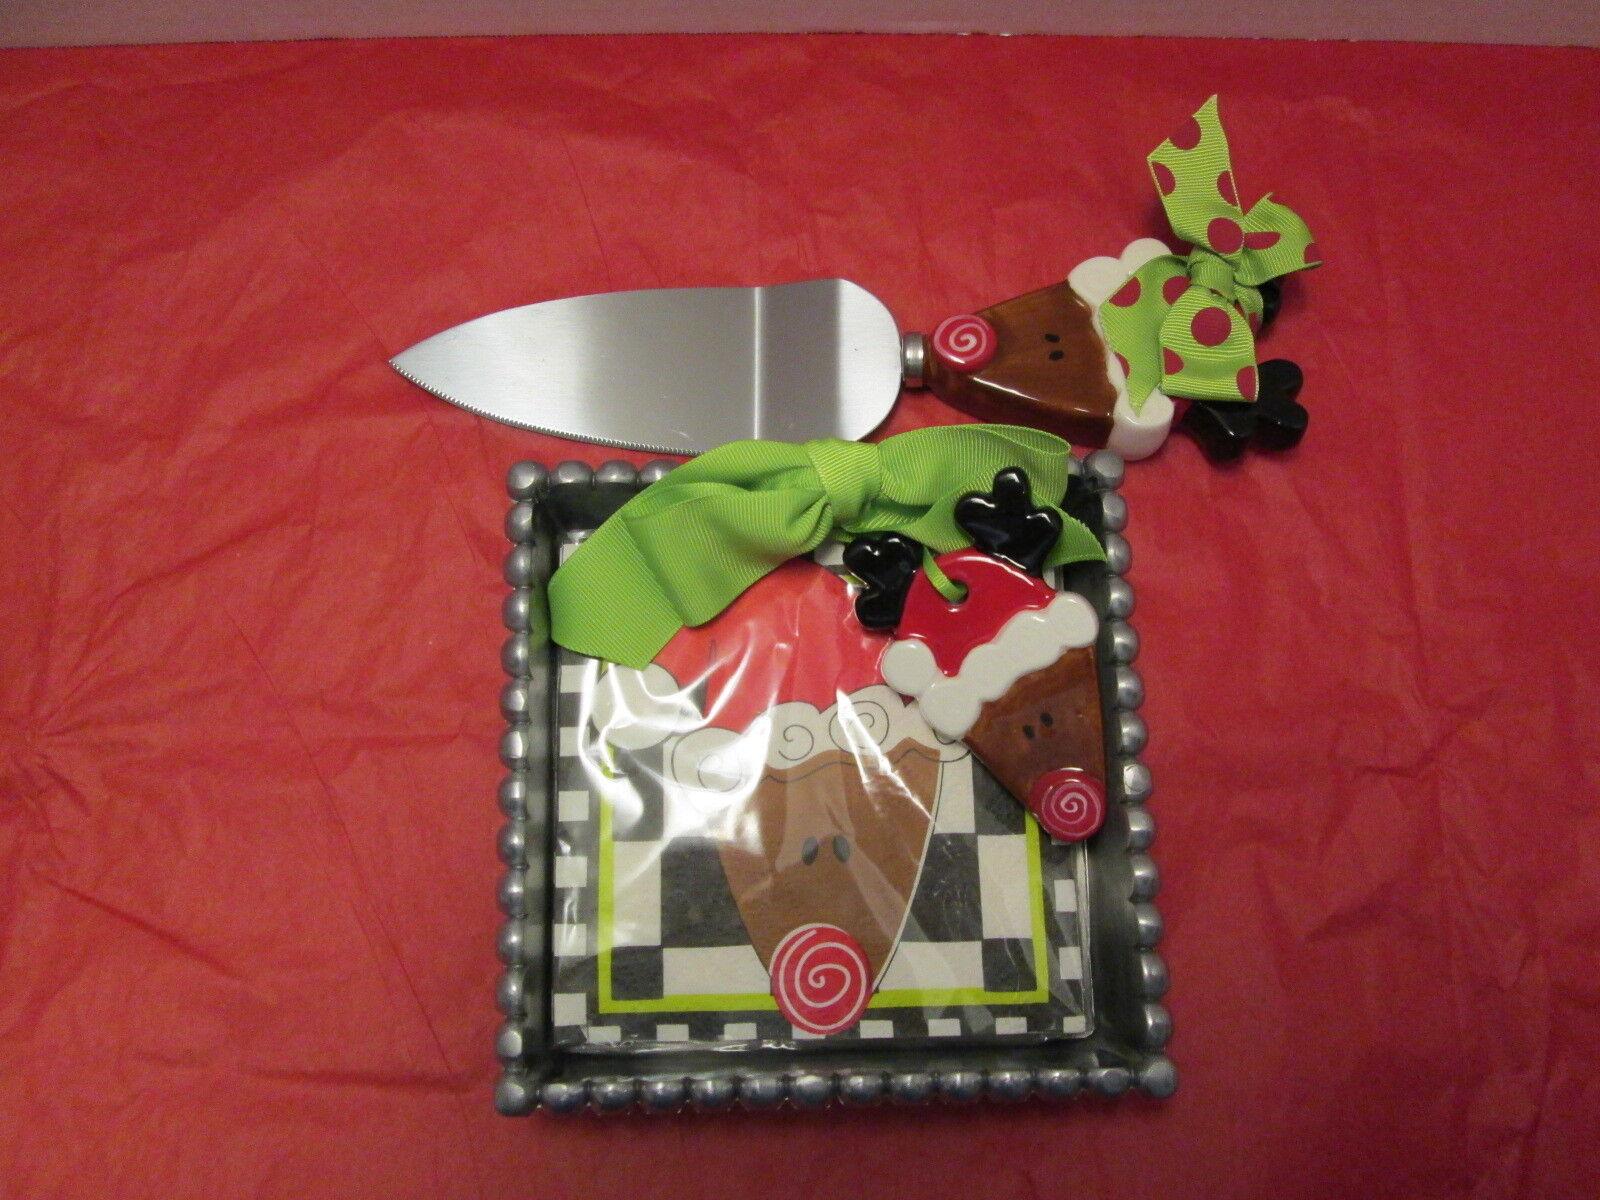 Holder 6 x 6 Mud Pie A Acrylic Napkin Holder Set Napkin 5 x 5